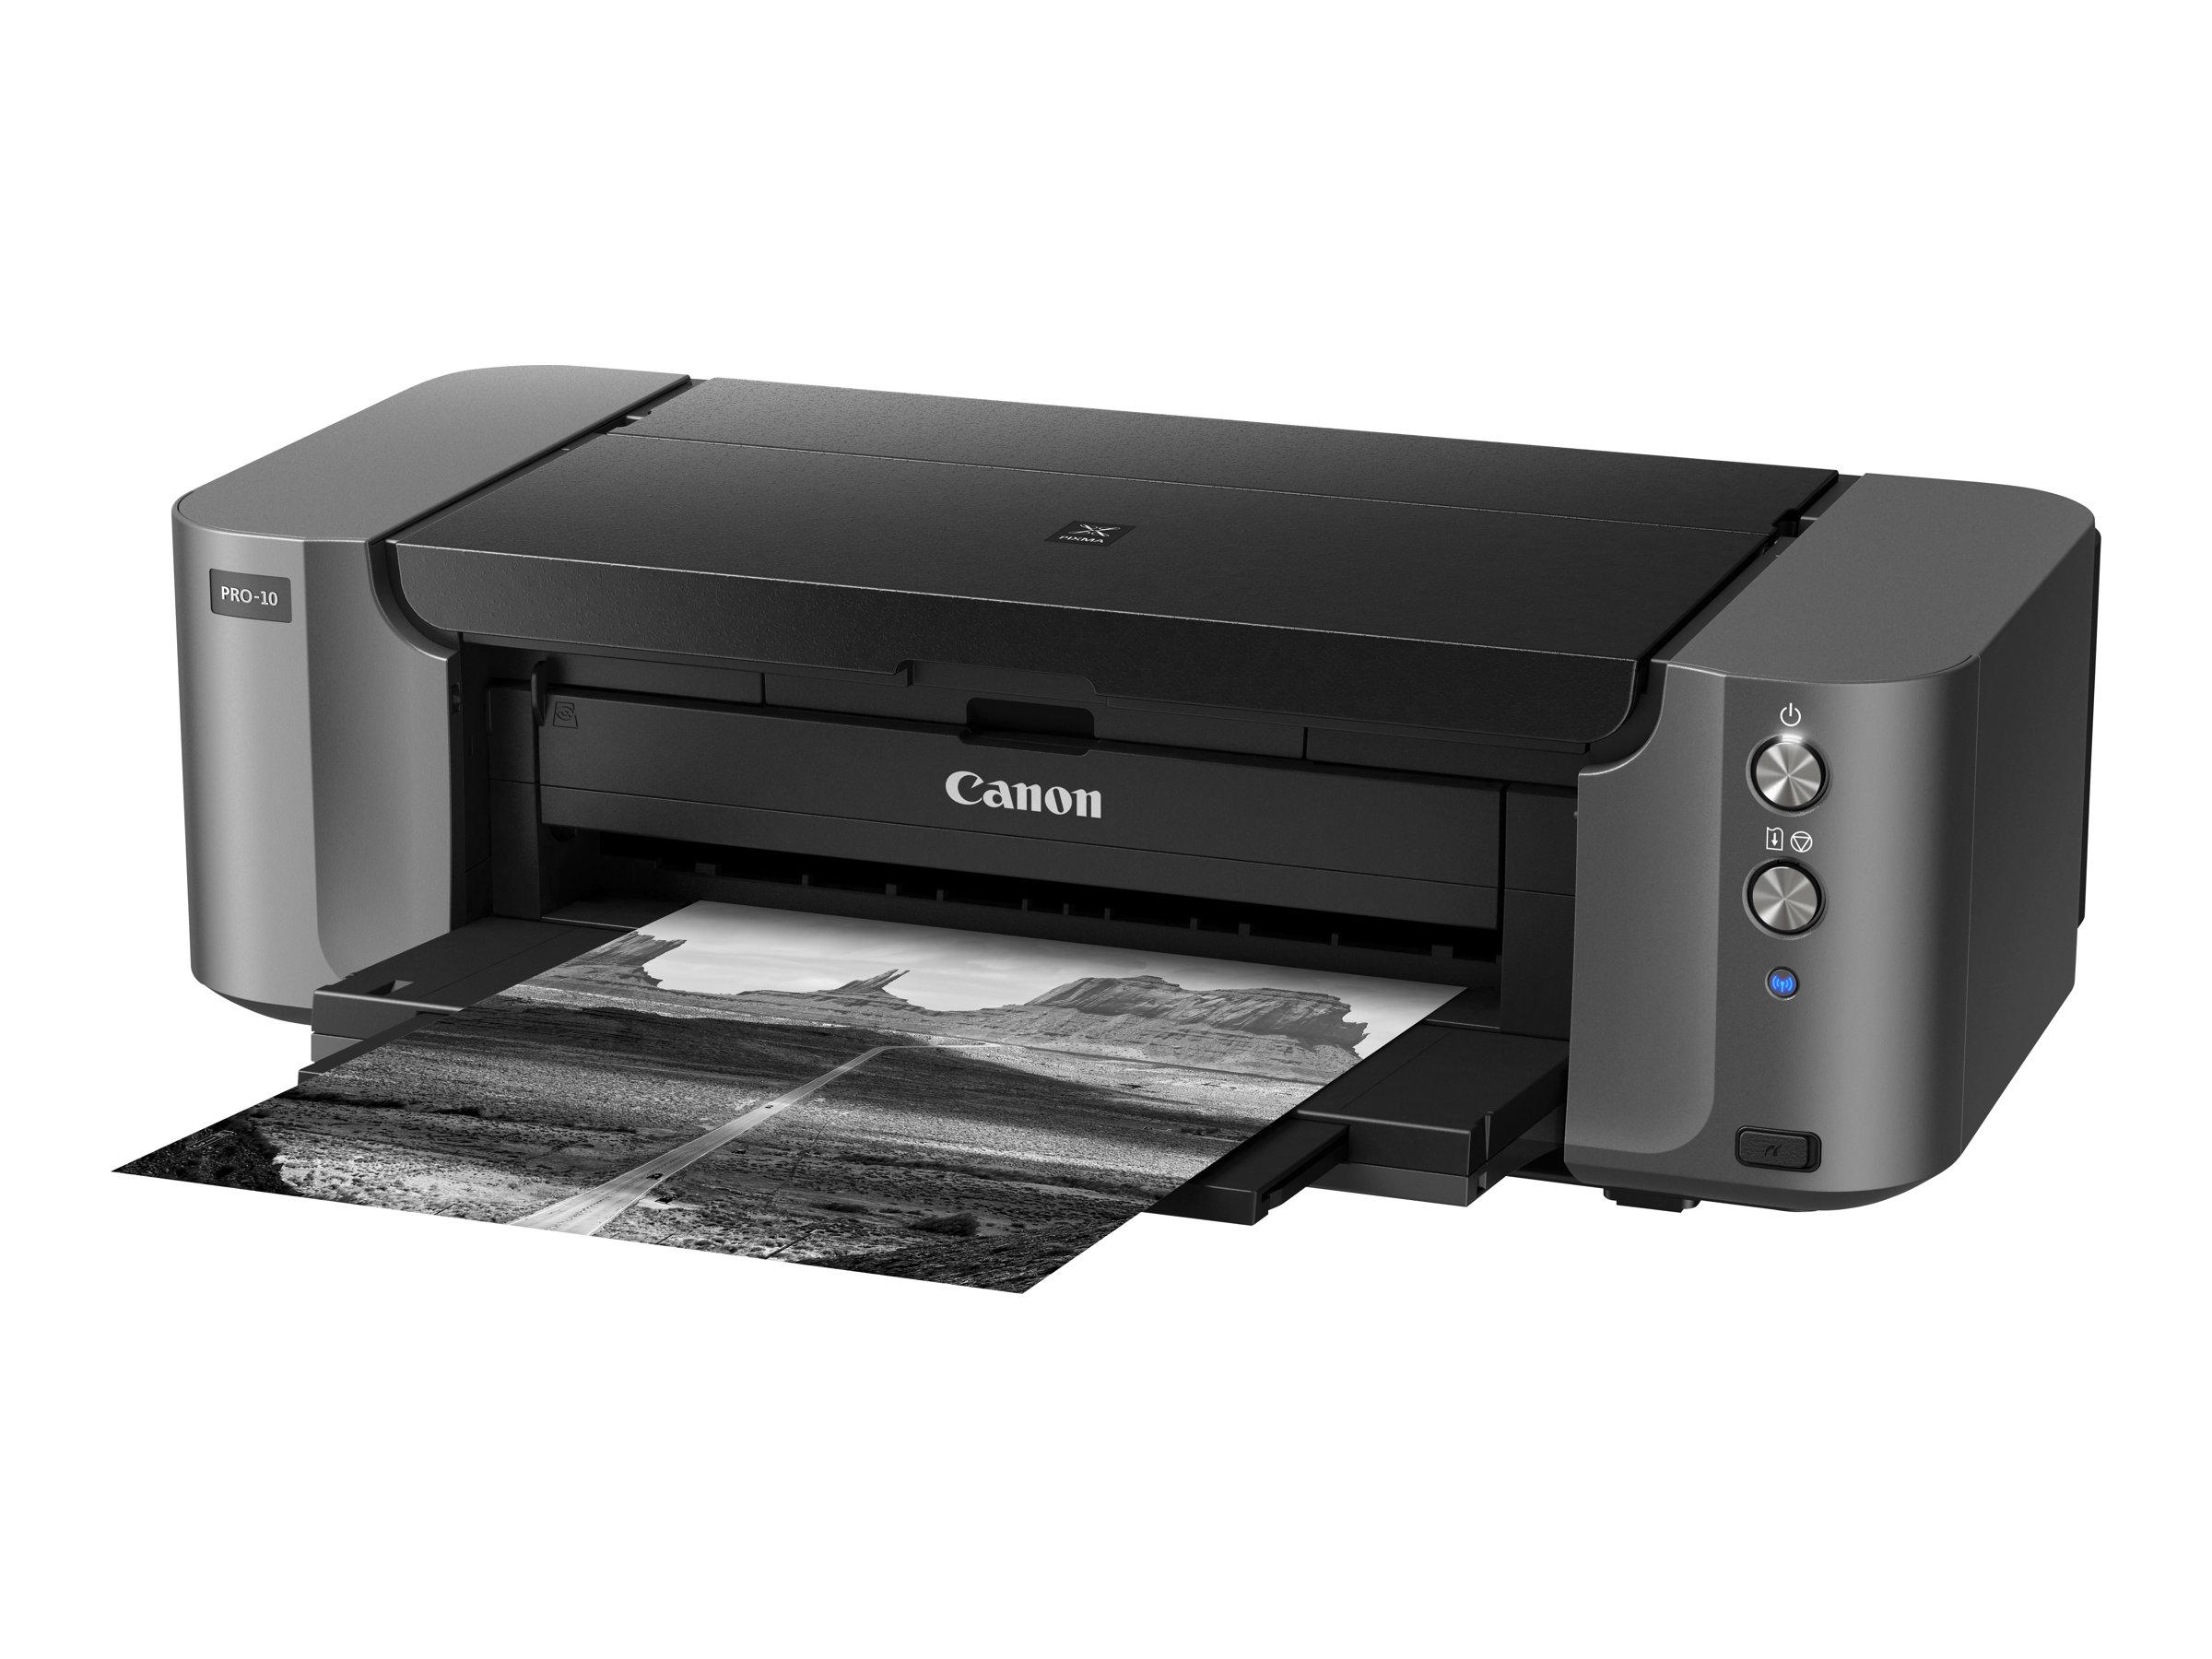 Canon PIXMA PRO-10S - Drucker - Farbe - Tintenstrahl - A3 Plus, 360 x 430 mm bis zu 3.58 Min./Seite (Farbe)